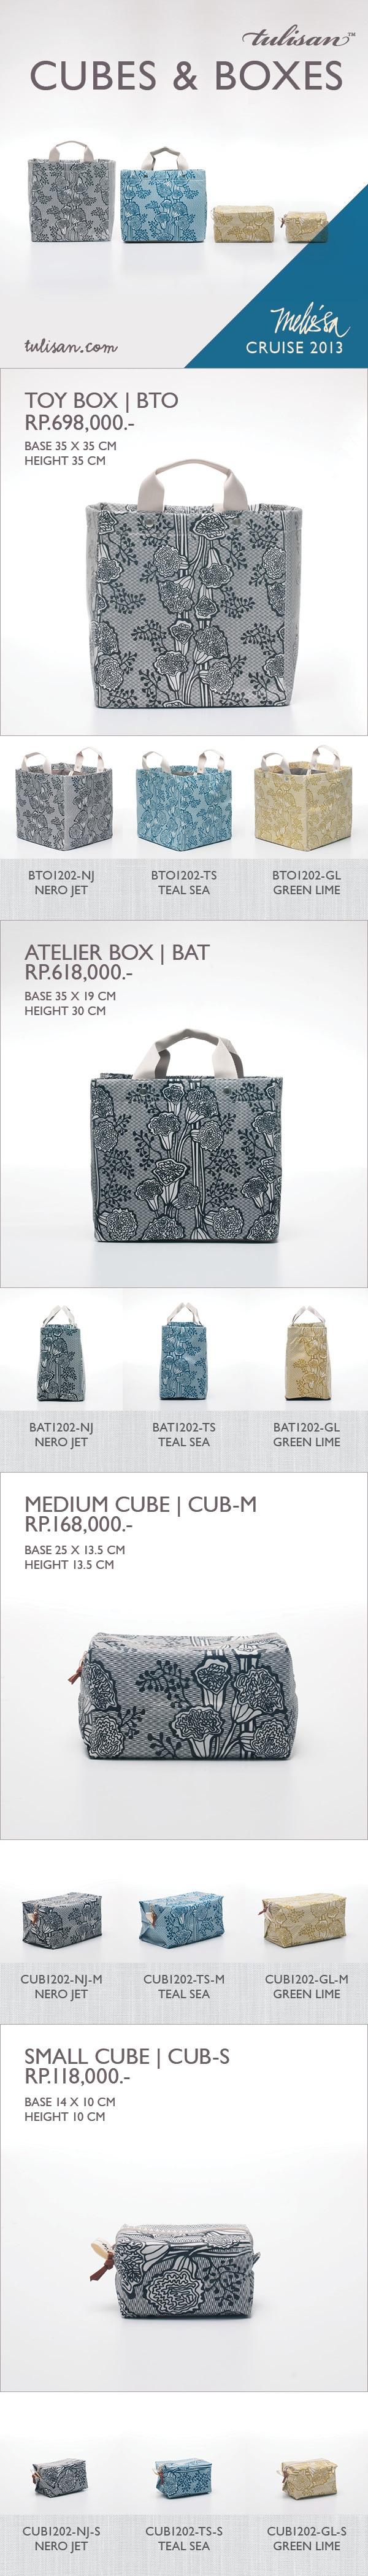 #Tulisan #Box #Cube #storage #organize #ideas #canvas #prints #illustration